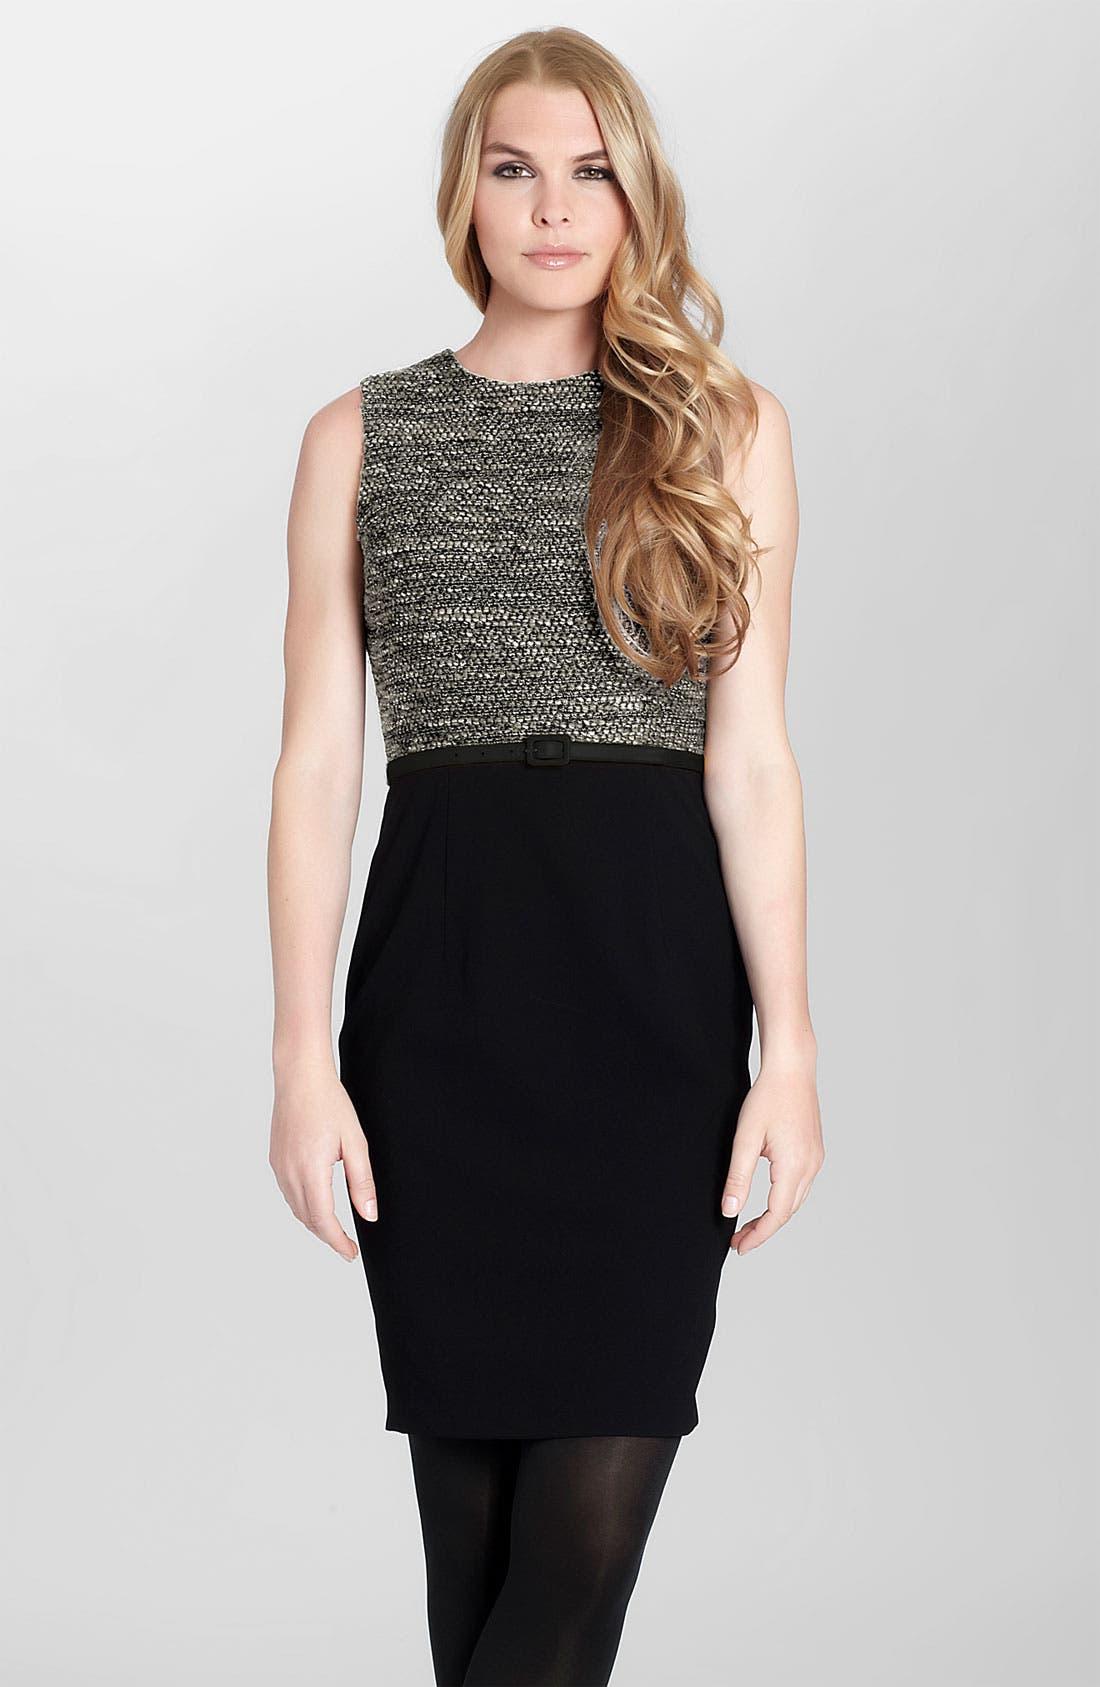 Alternate Image 1 Selected - Cynthia Steffe 'Calista' Tweed Bodice Sheath Dress